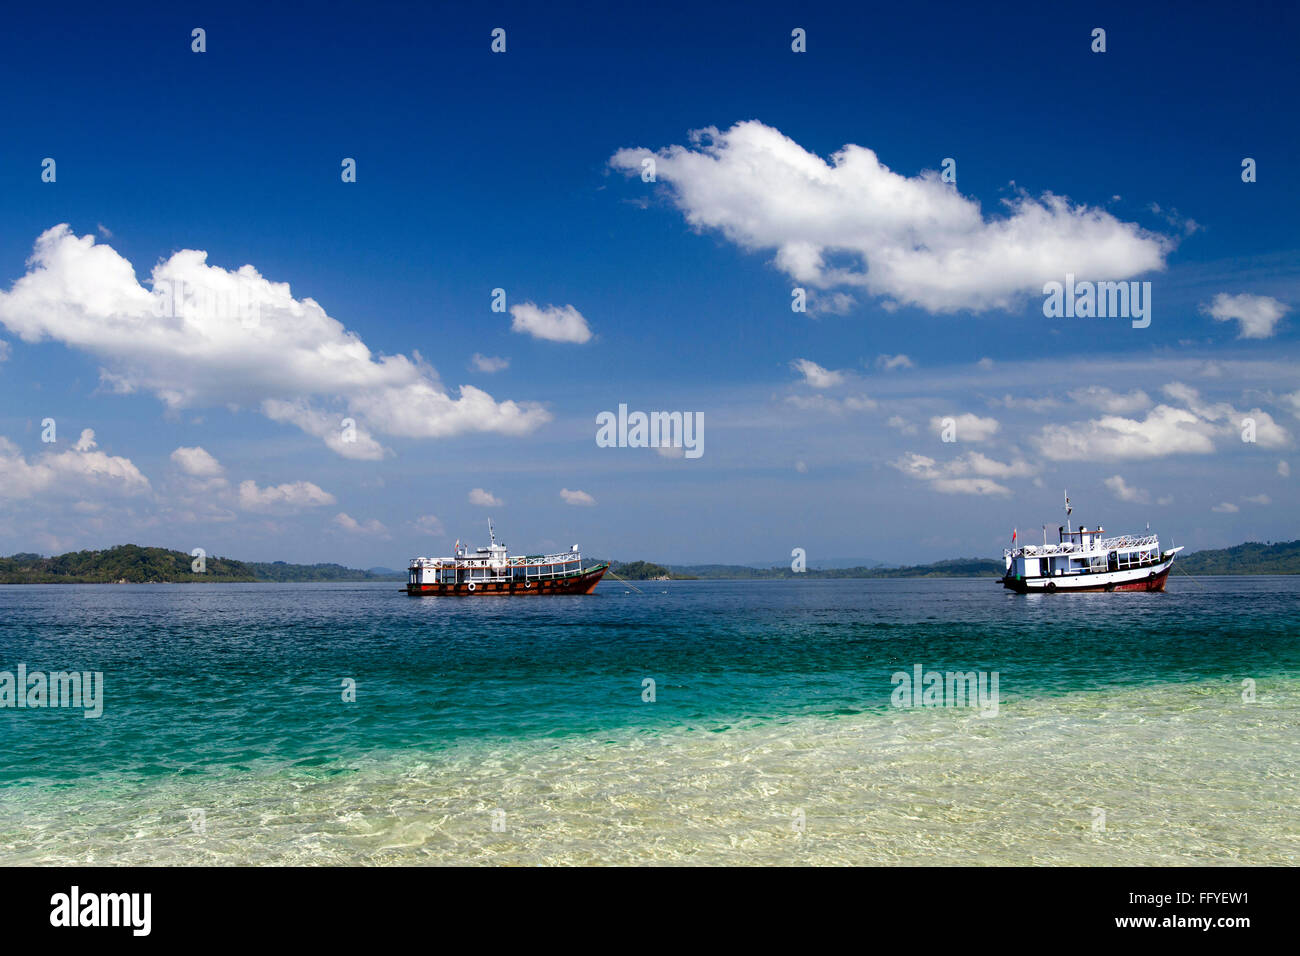 Jolly boya cerca de la isla de Andamán Wandoor India Asia Imagen De Stock